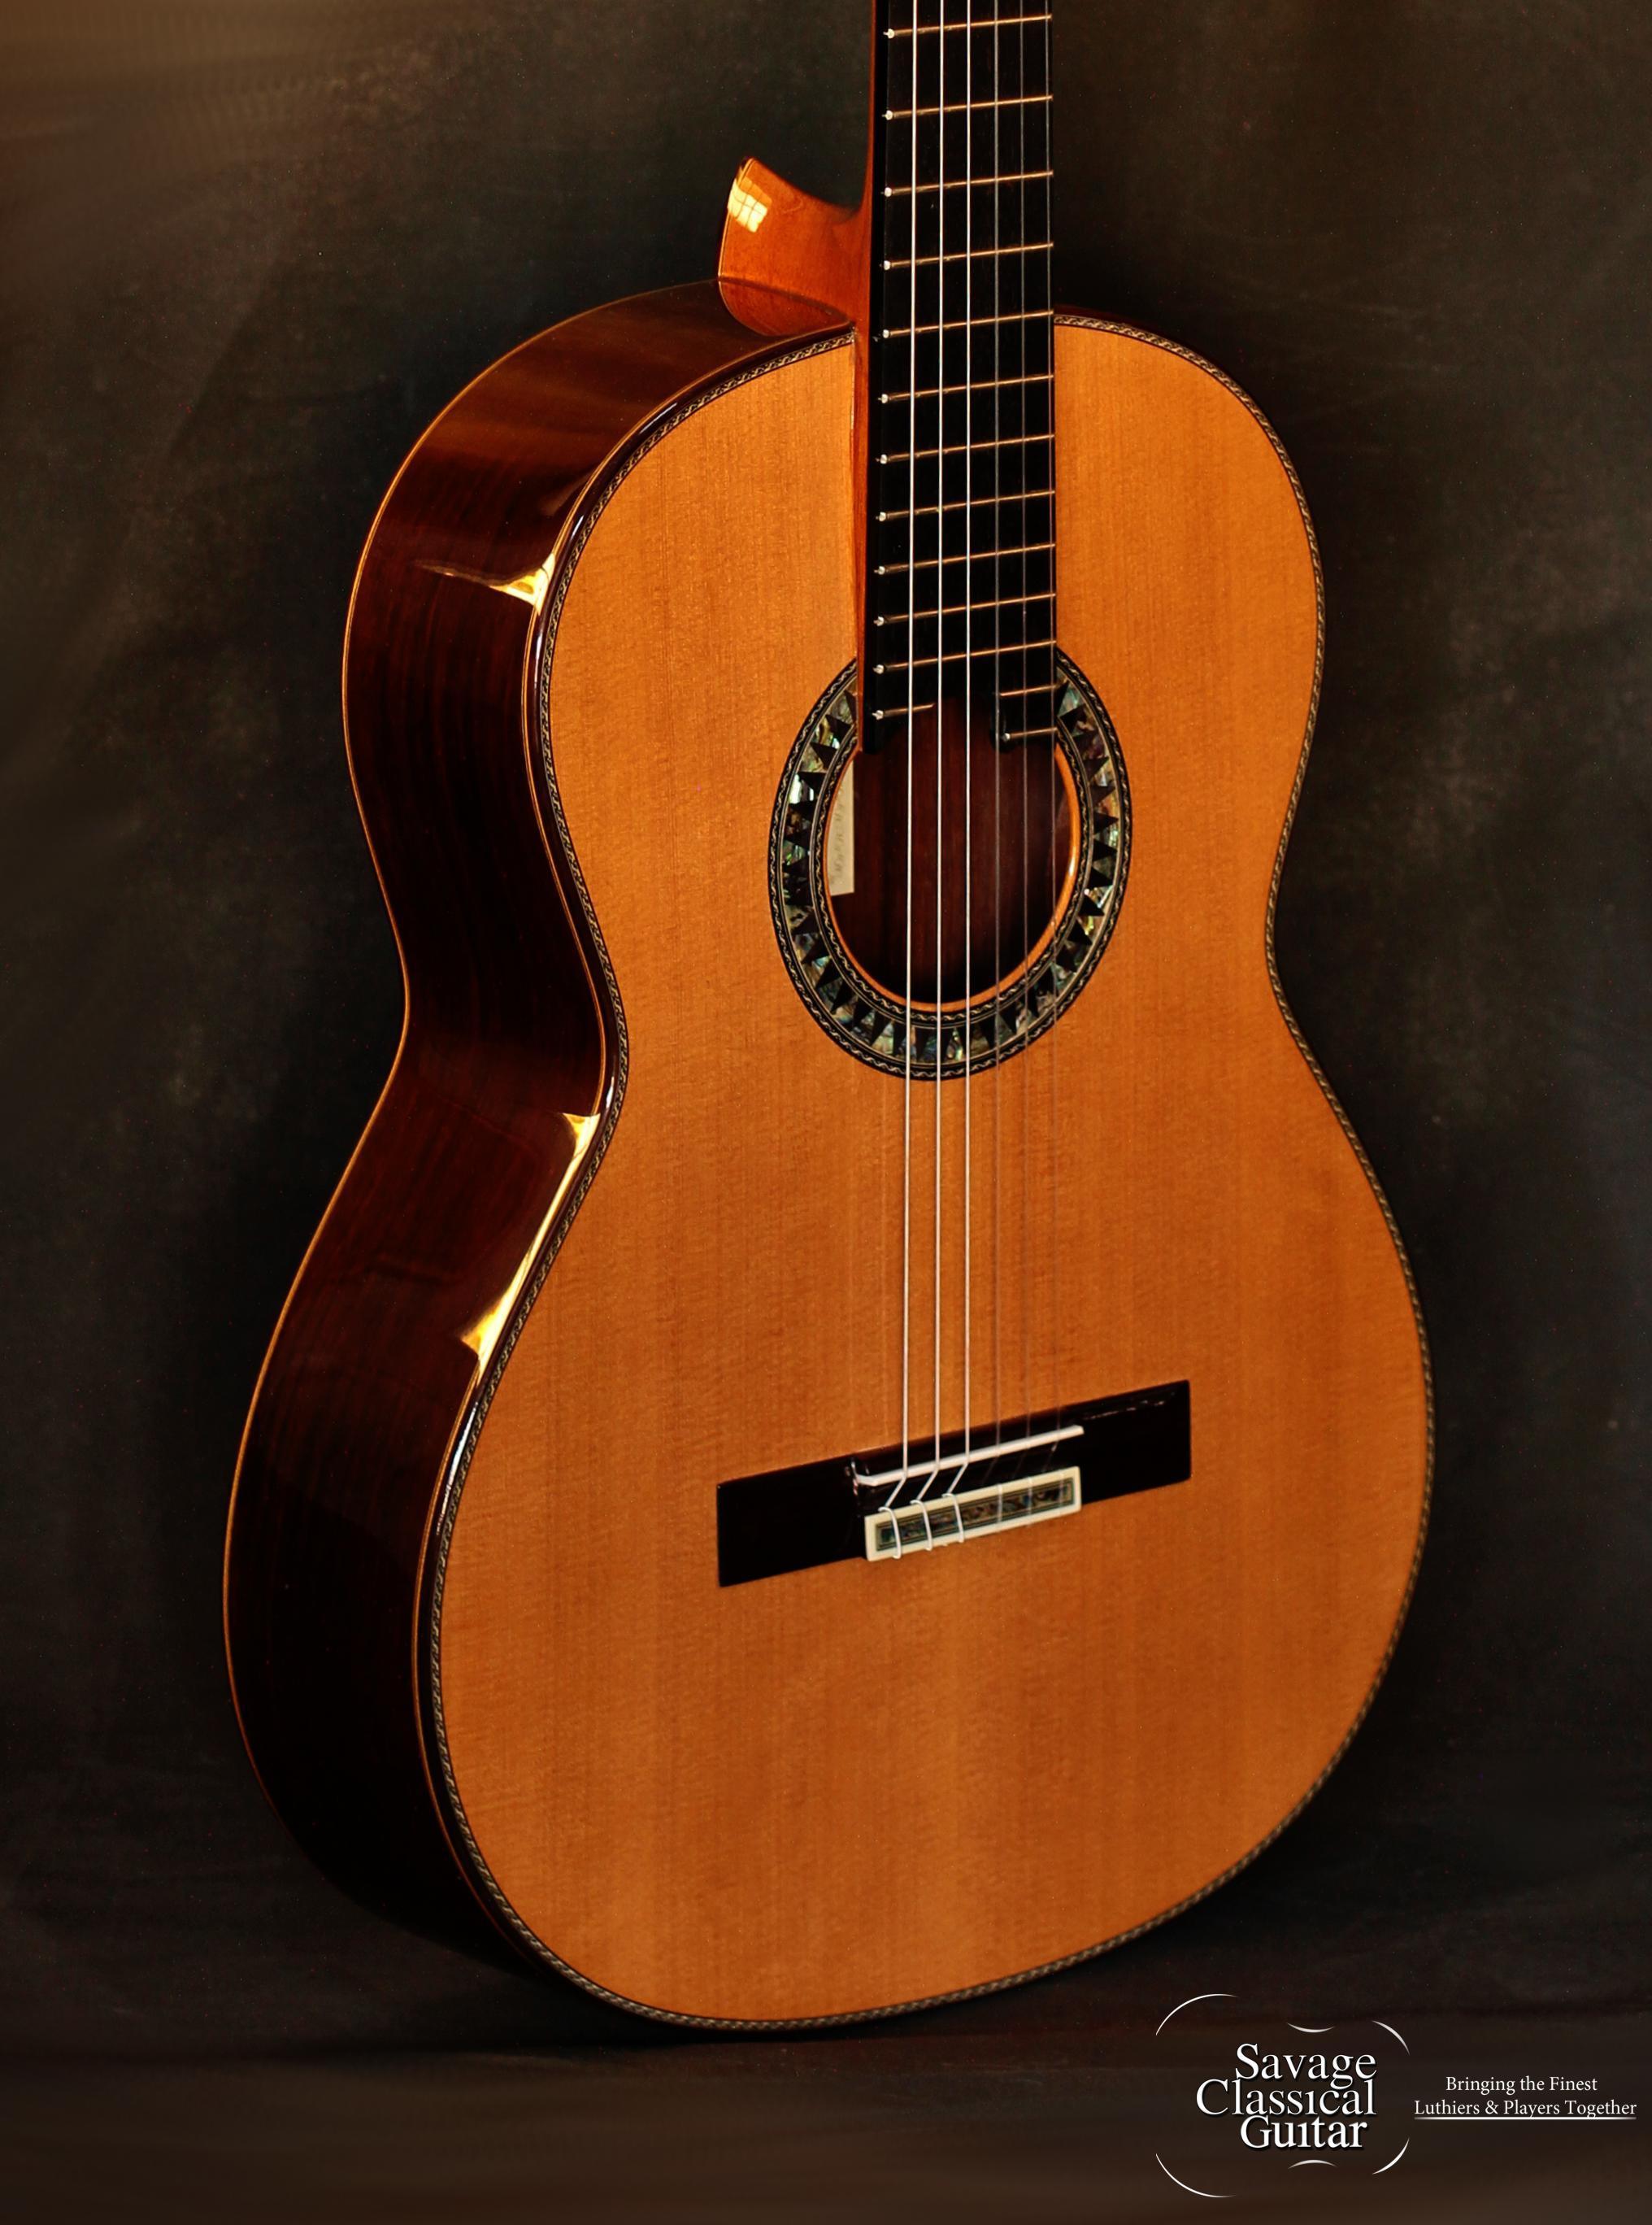 Manuel Adalid Anniversario 61 Cedar Savage Classical Guitar